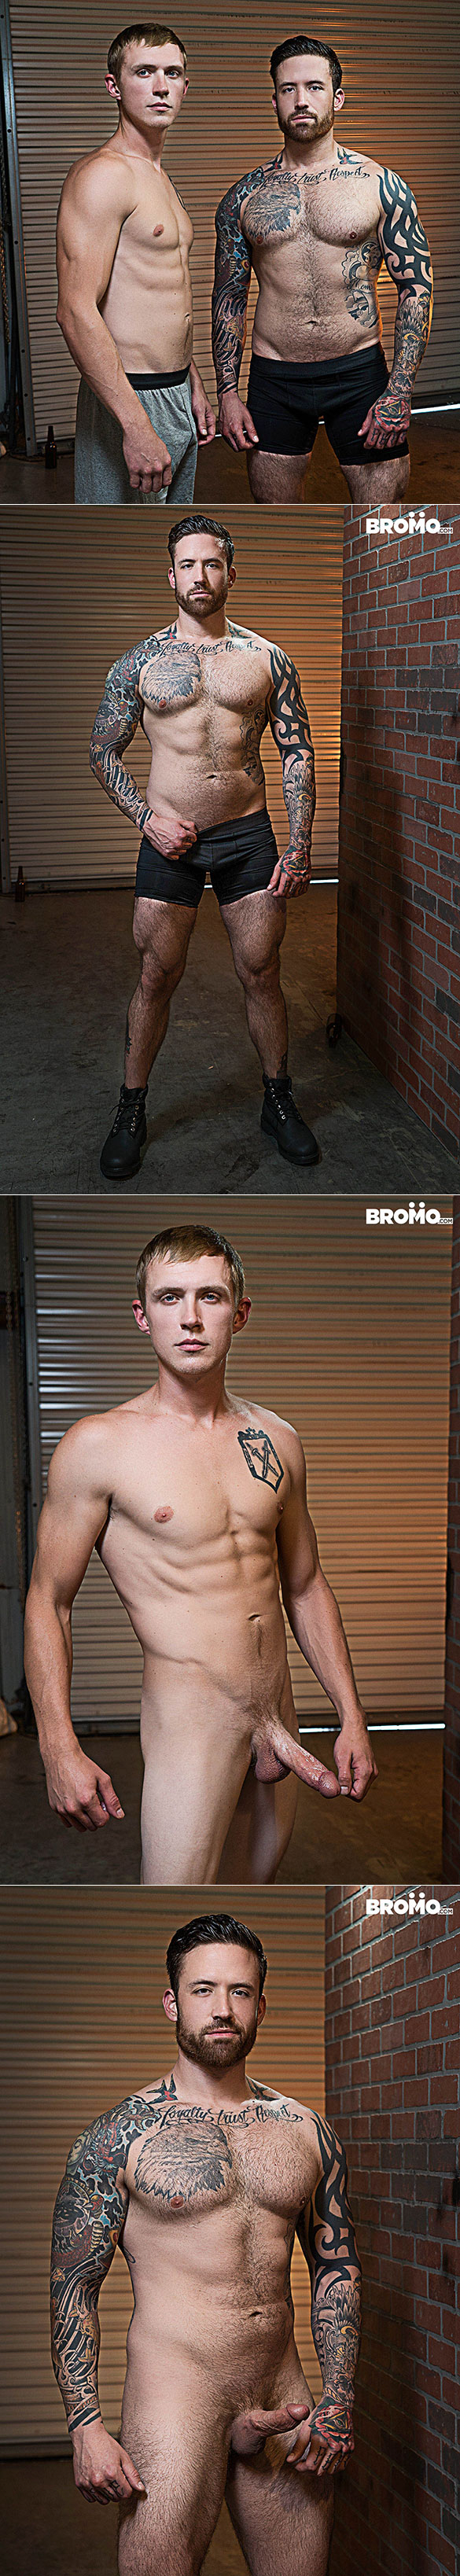 "Bromo: Jordan Levine drills Zane Anders raw in ""Whore Alley, Part 1"""